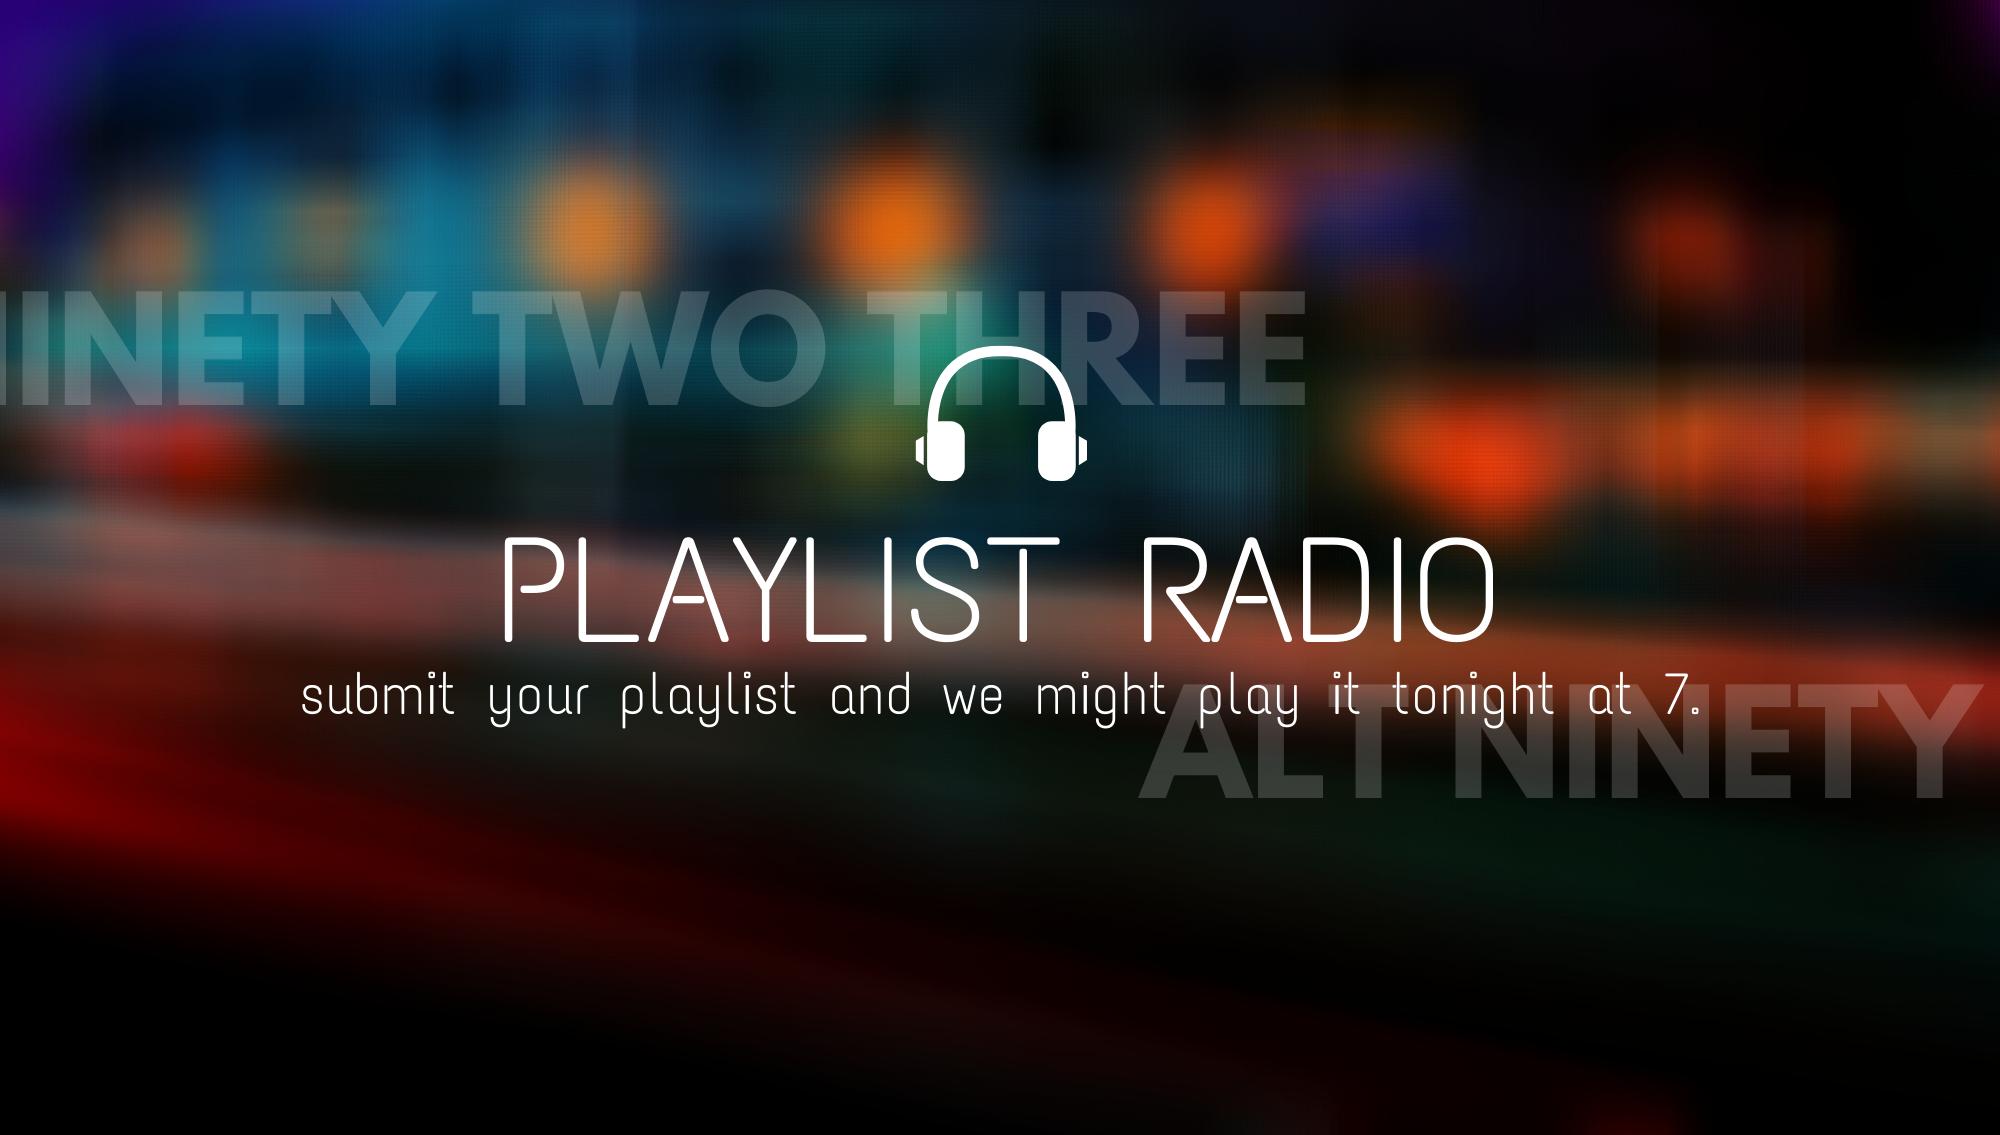 Playlist Radio